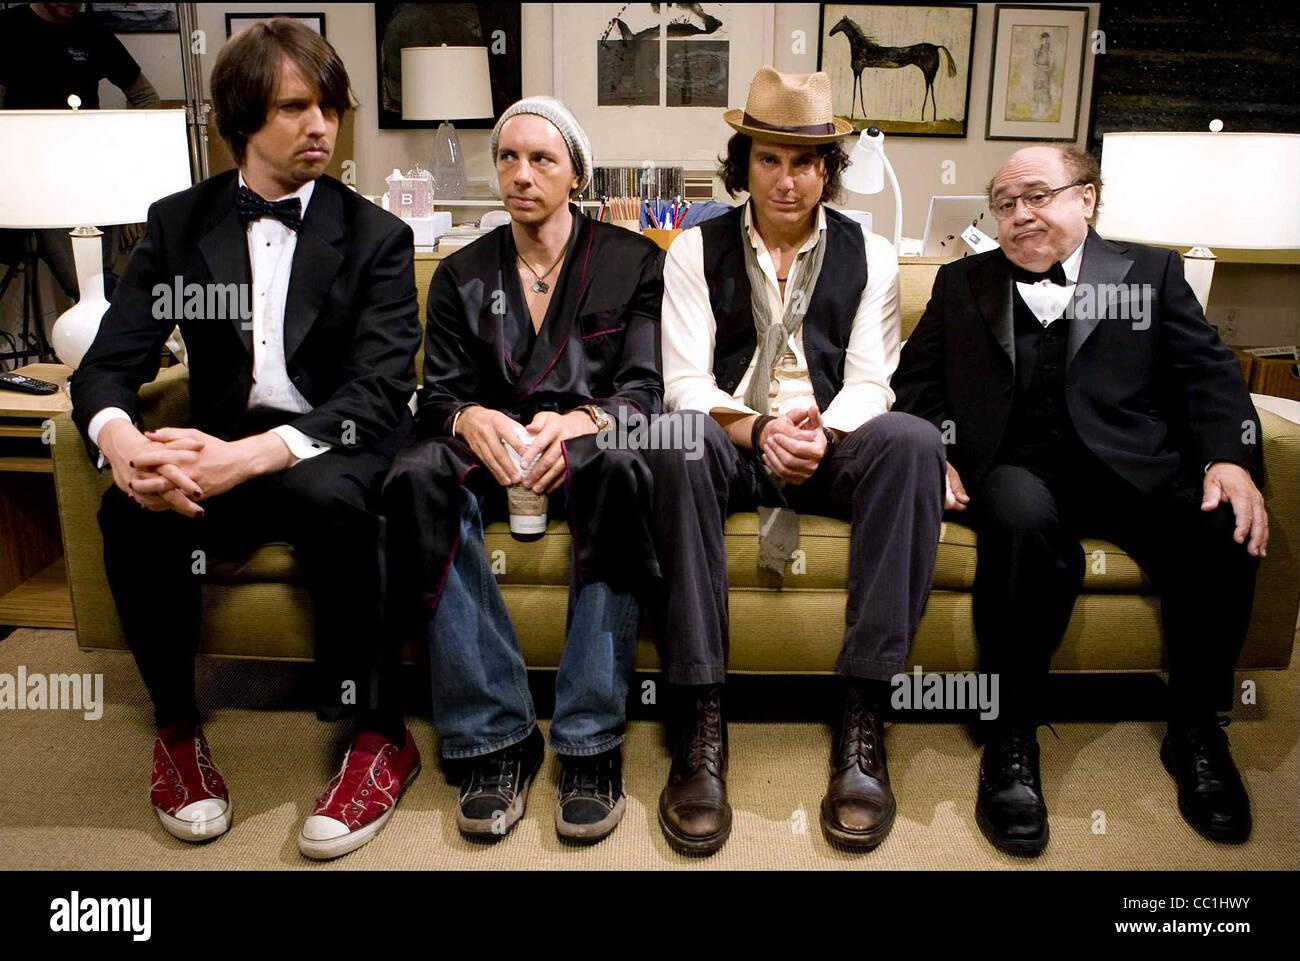 HEDER,SHEPARD,ARNETT,DEVITO, WHEN IN ROME, 2010 Stock Photo